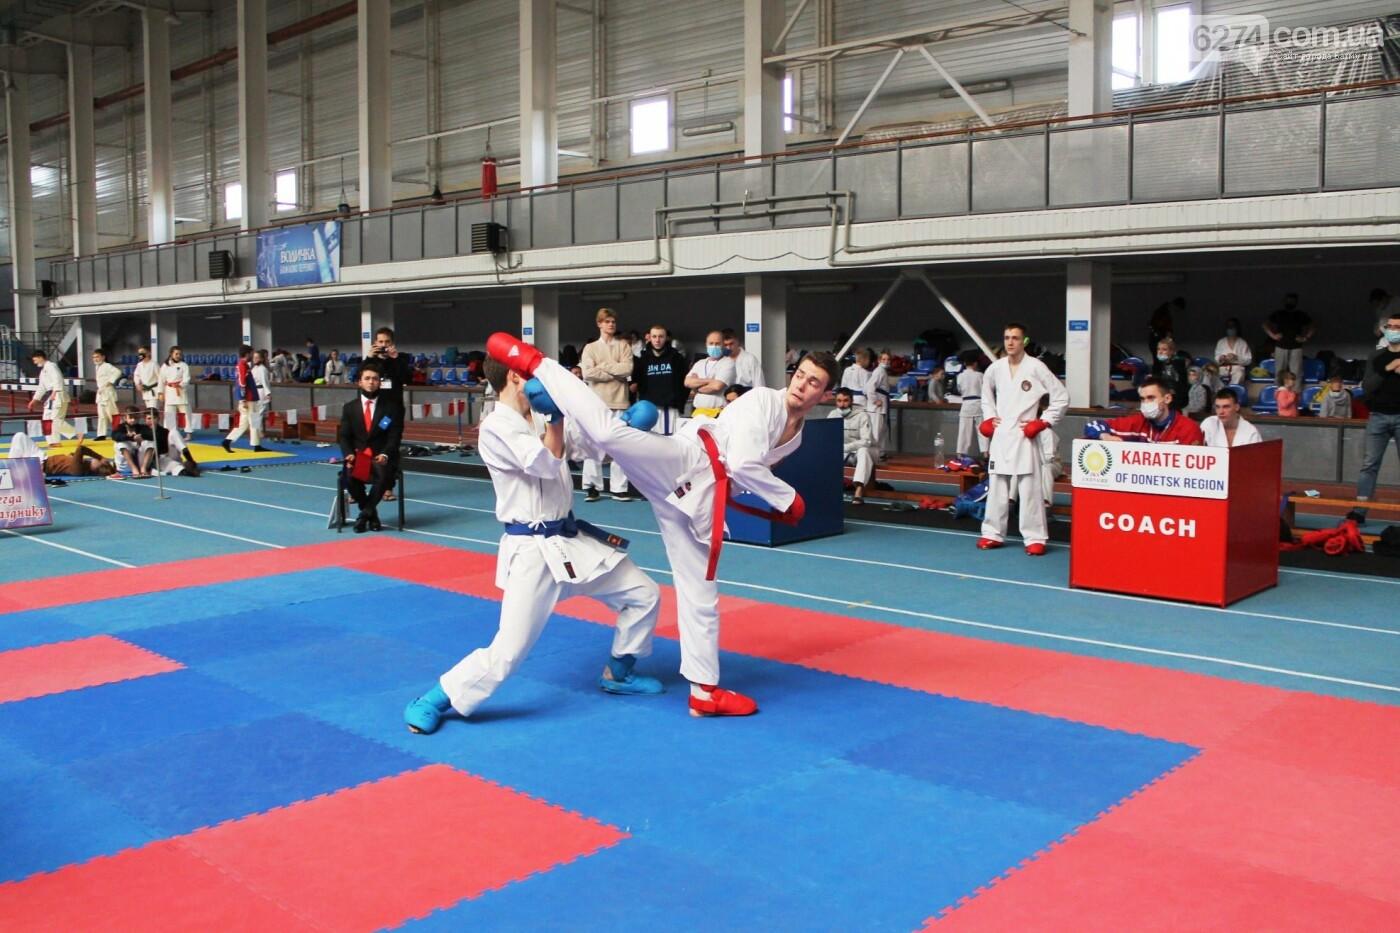 Бахмут гостеприимно принимал чемпионат Донецкой области по каратэ, фото-3